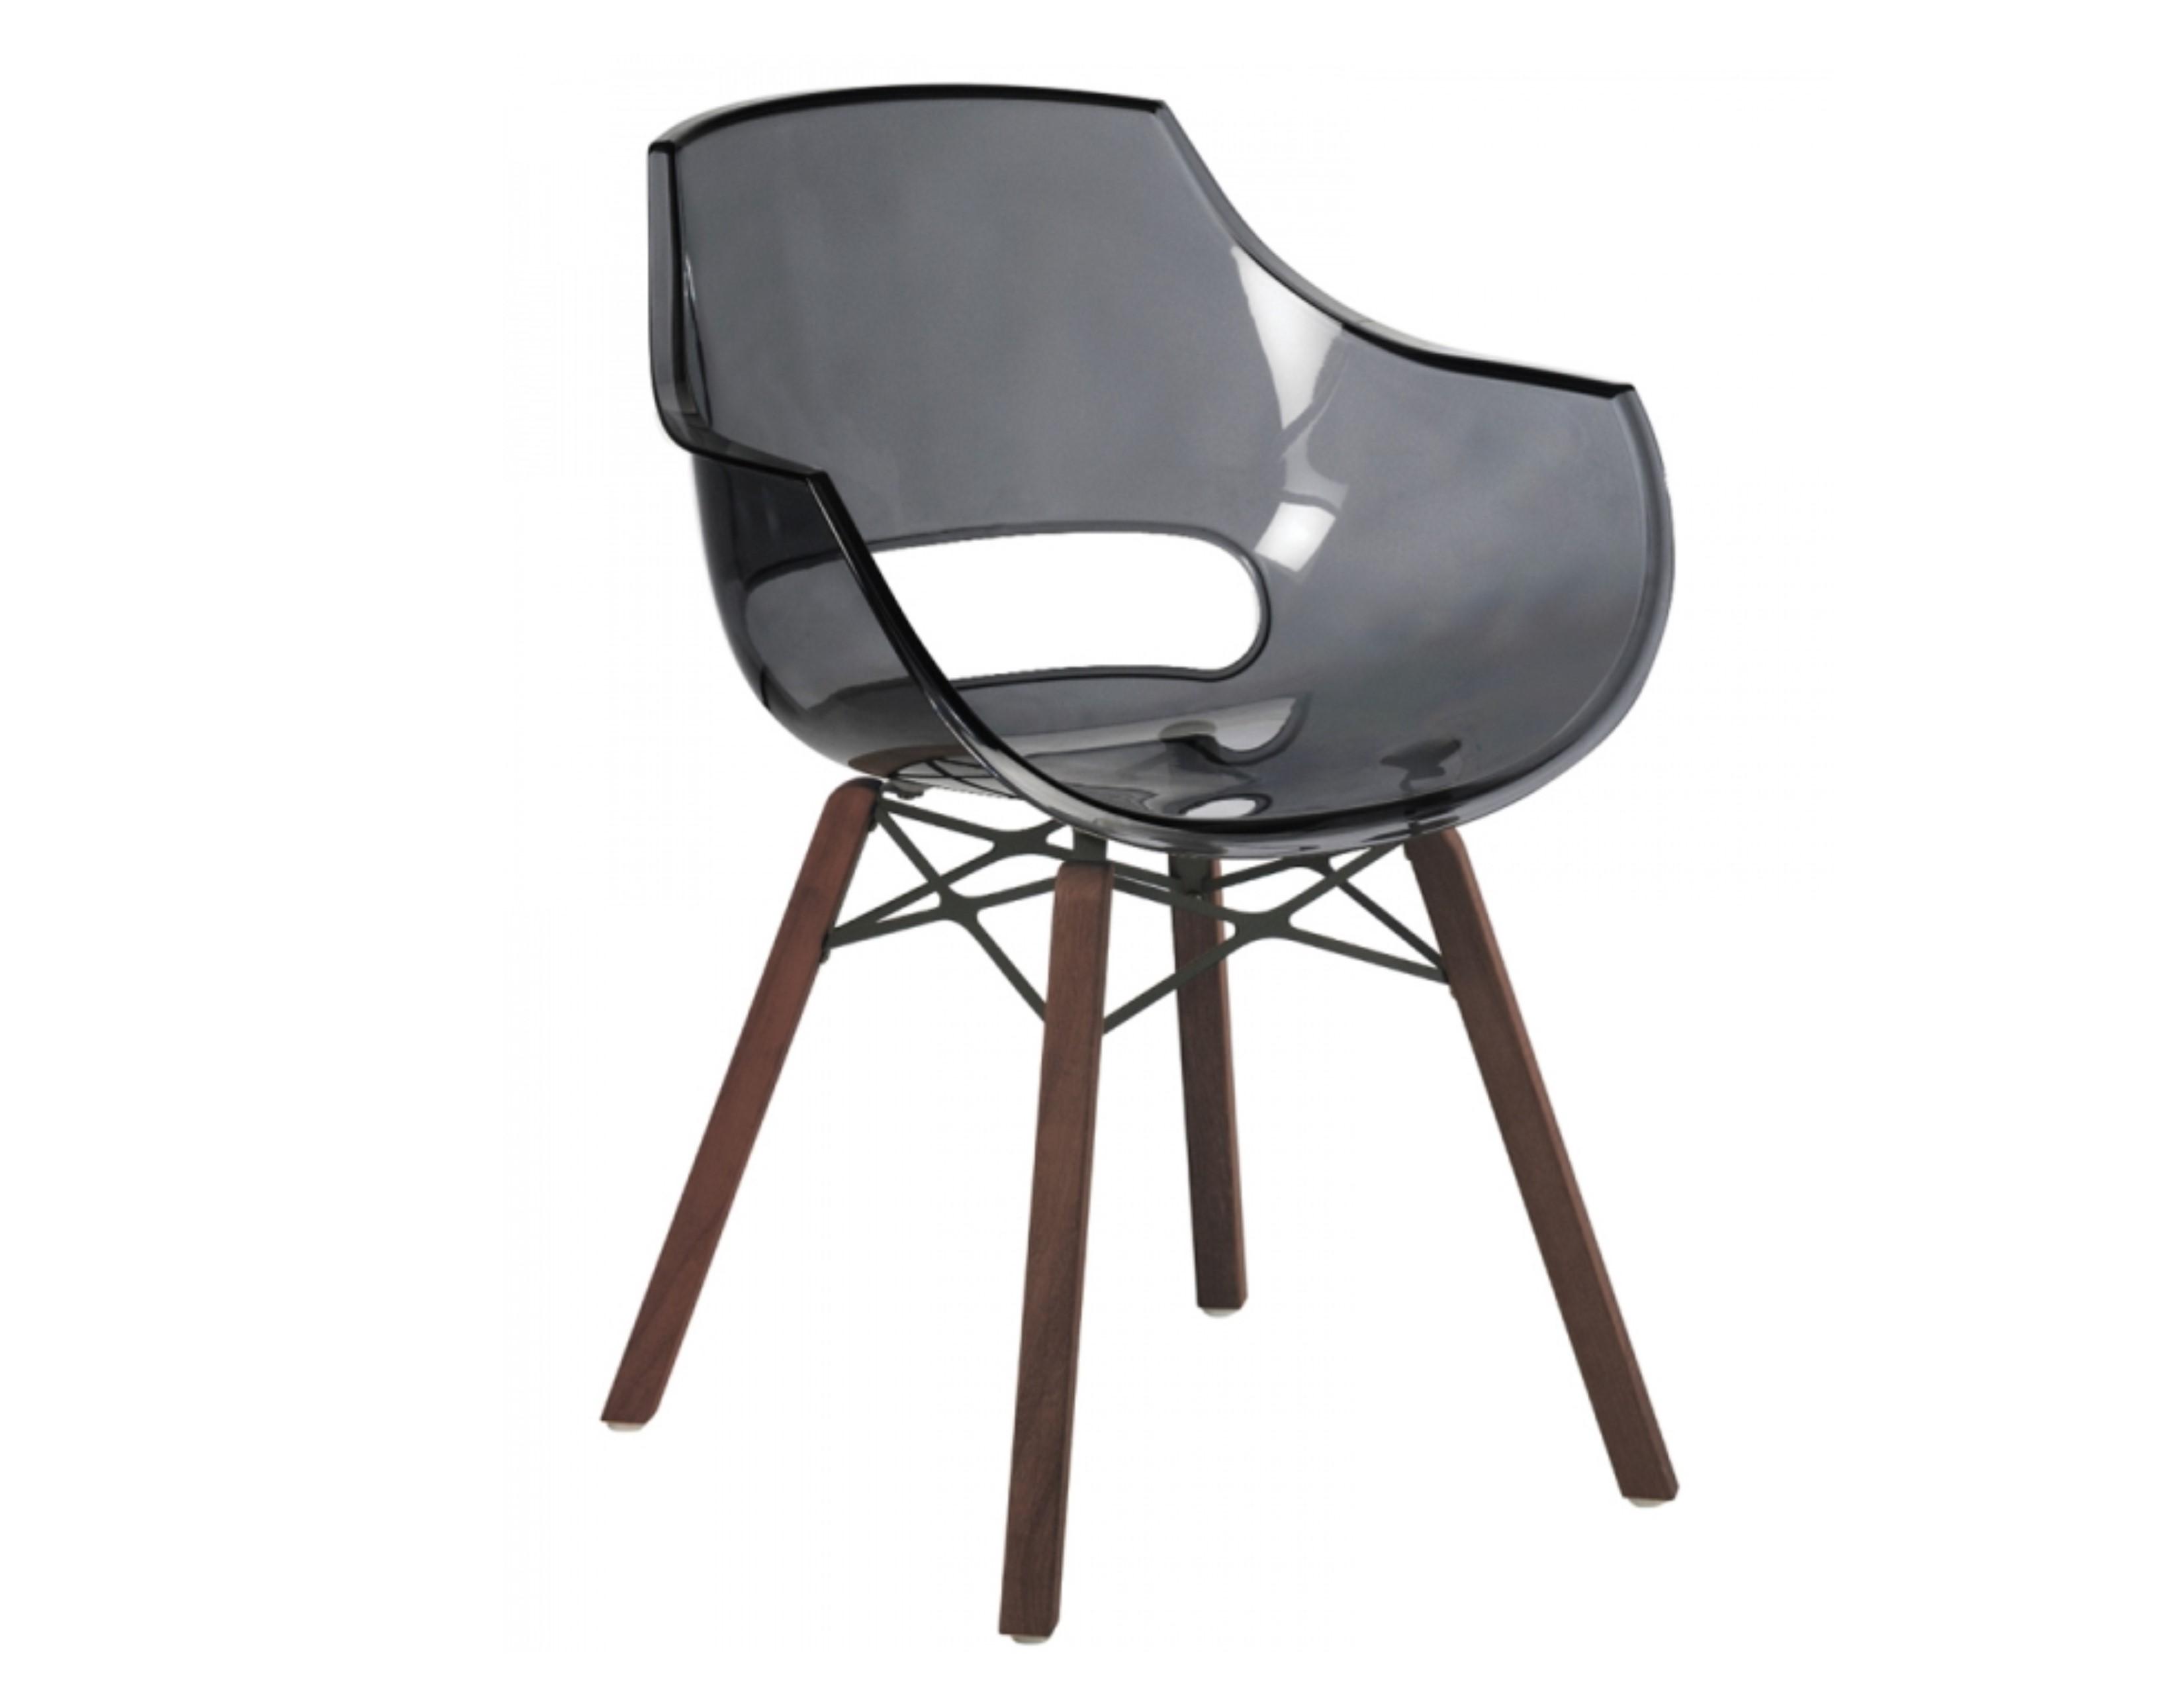 Austin Injection Mould Polypropylene Transparent Ghost Chair Grey Plastic  Teak Iroko Oak Wood Dowel Leg Like